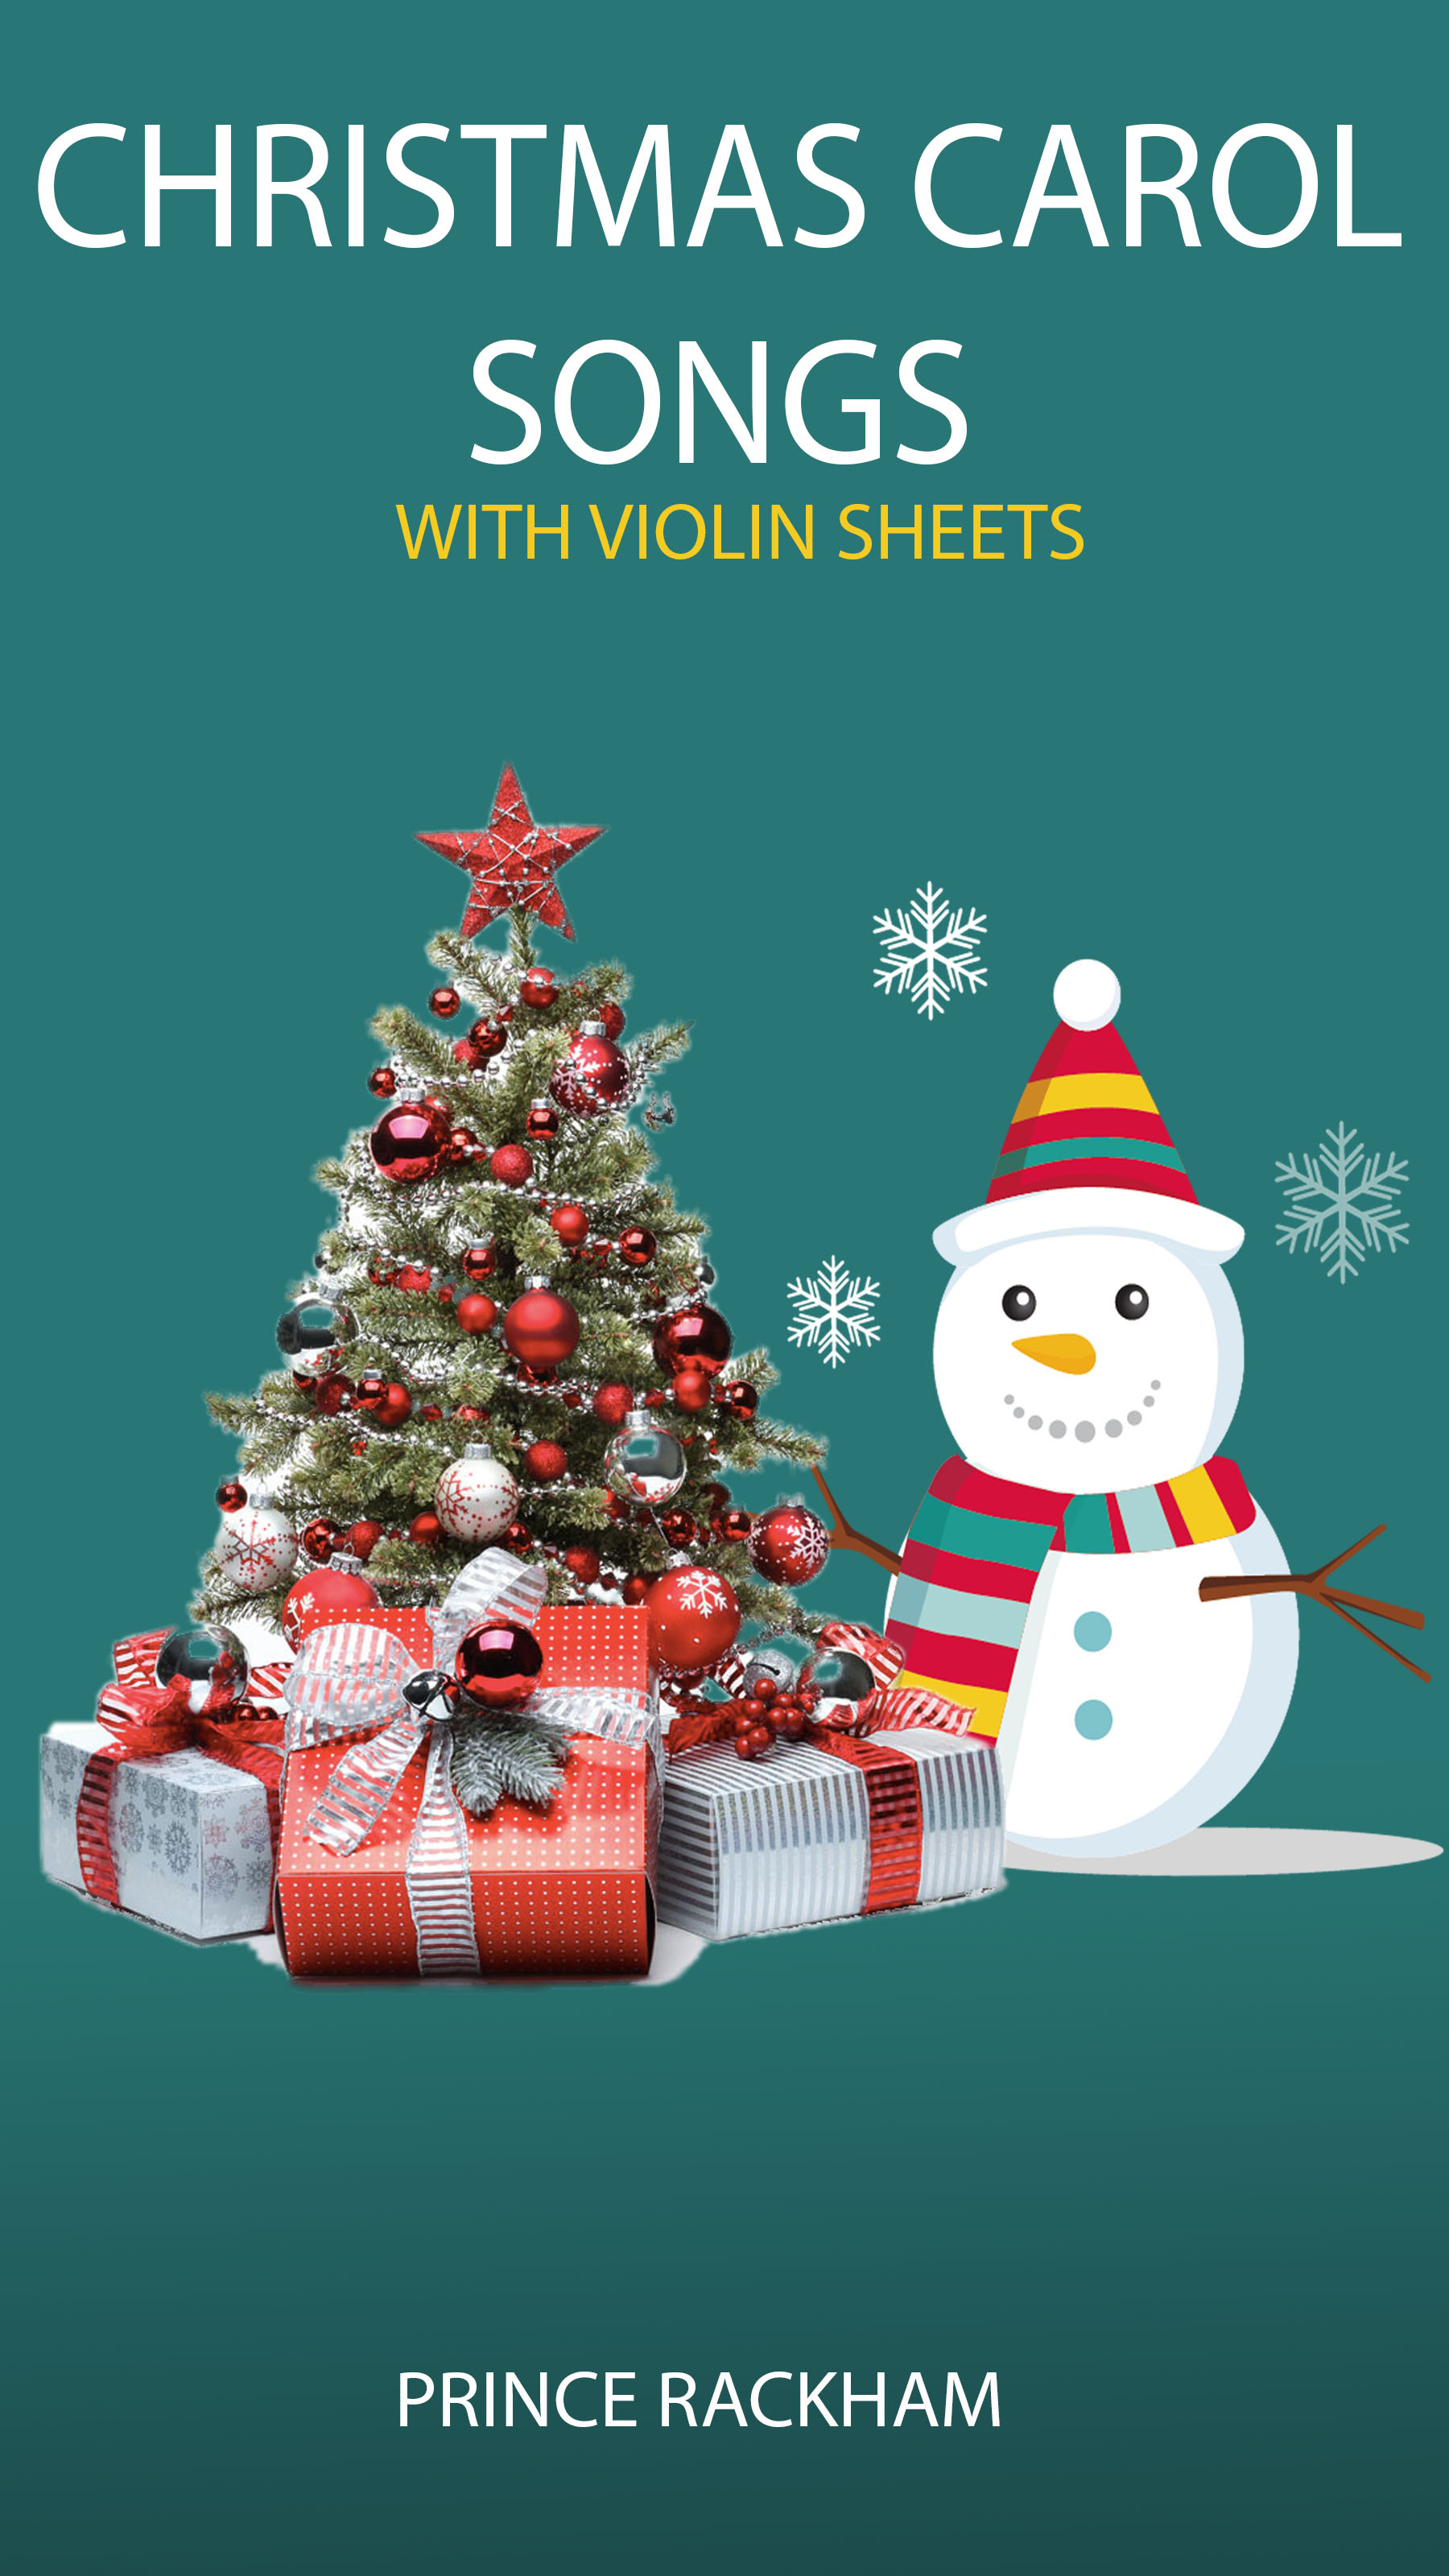 Christmas Carol Songs With Violin Sheets, an Ebook by Prince Rackham